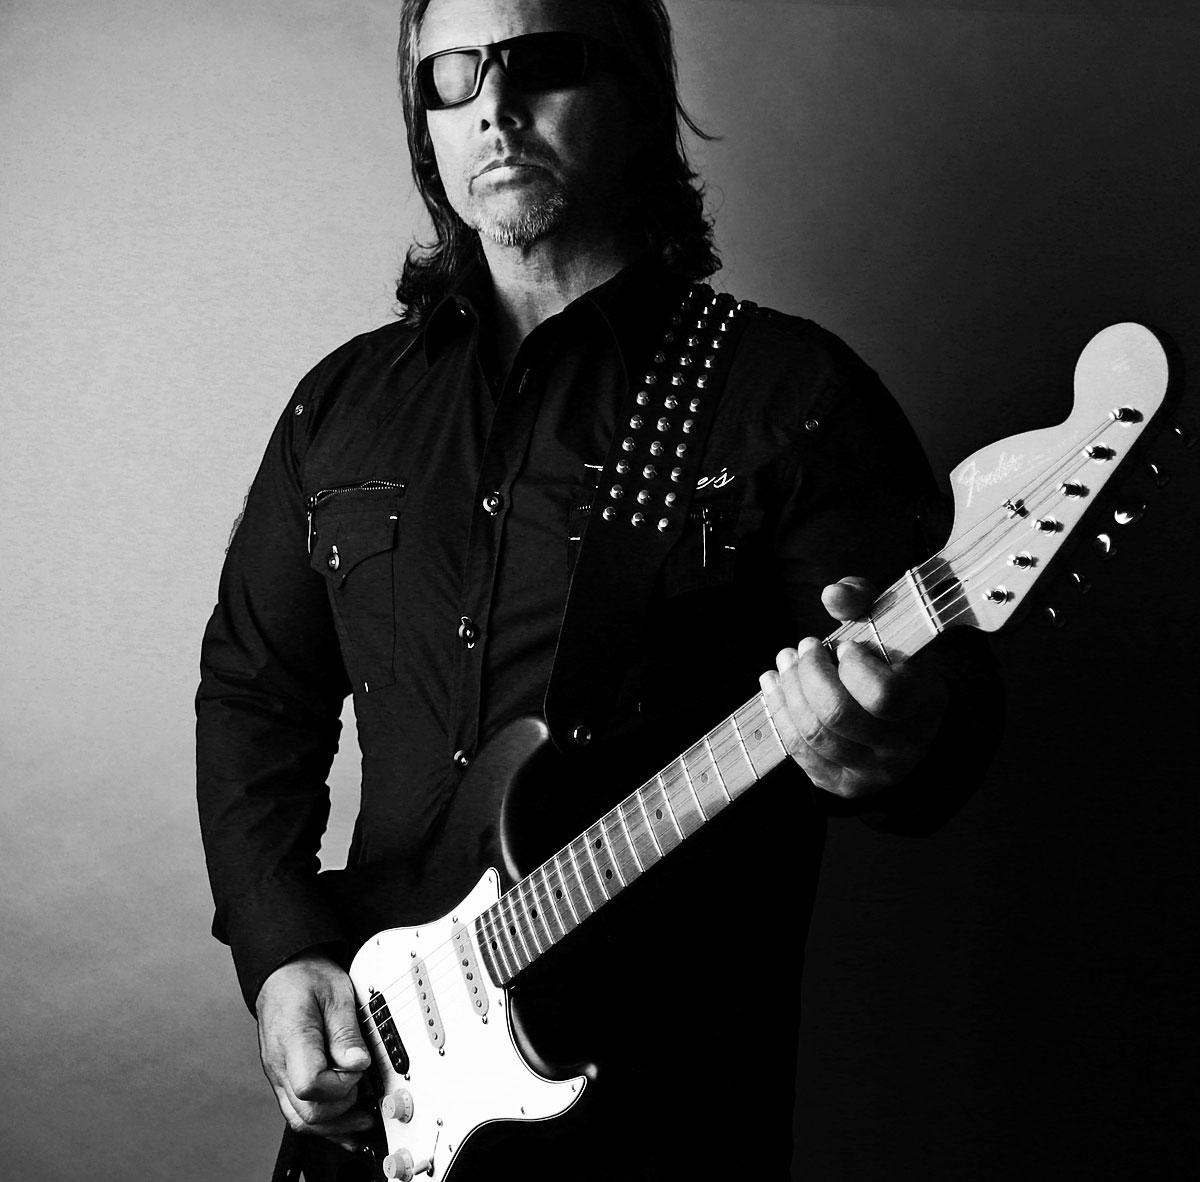 hank_shermann_guitarist_2016bw